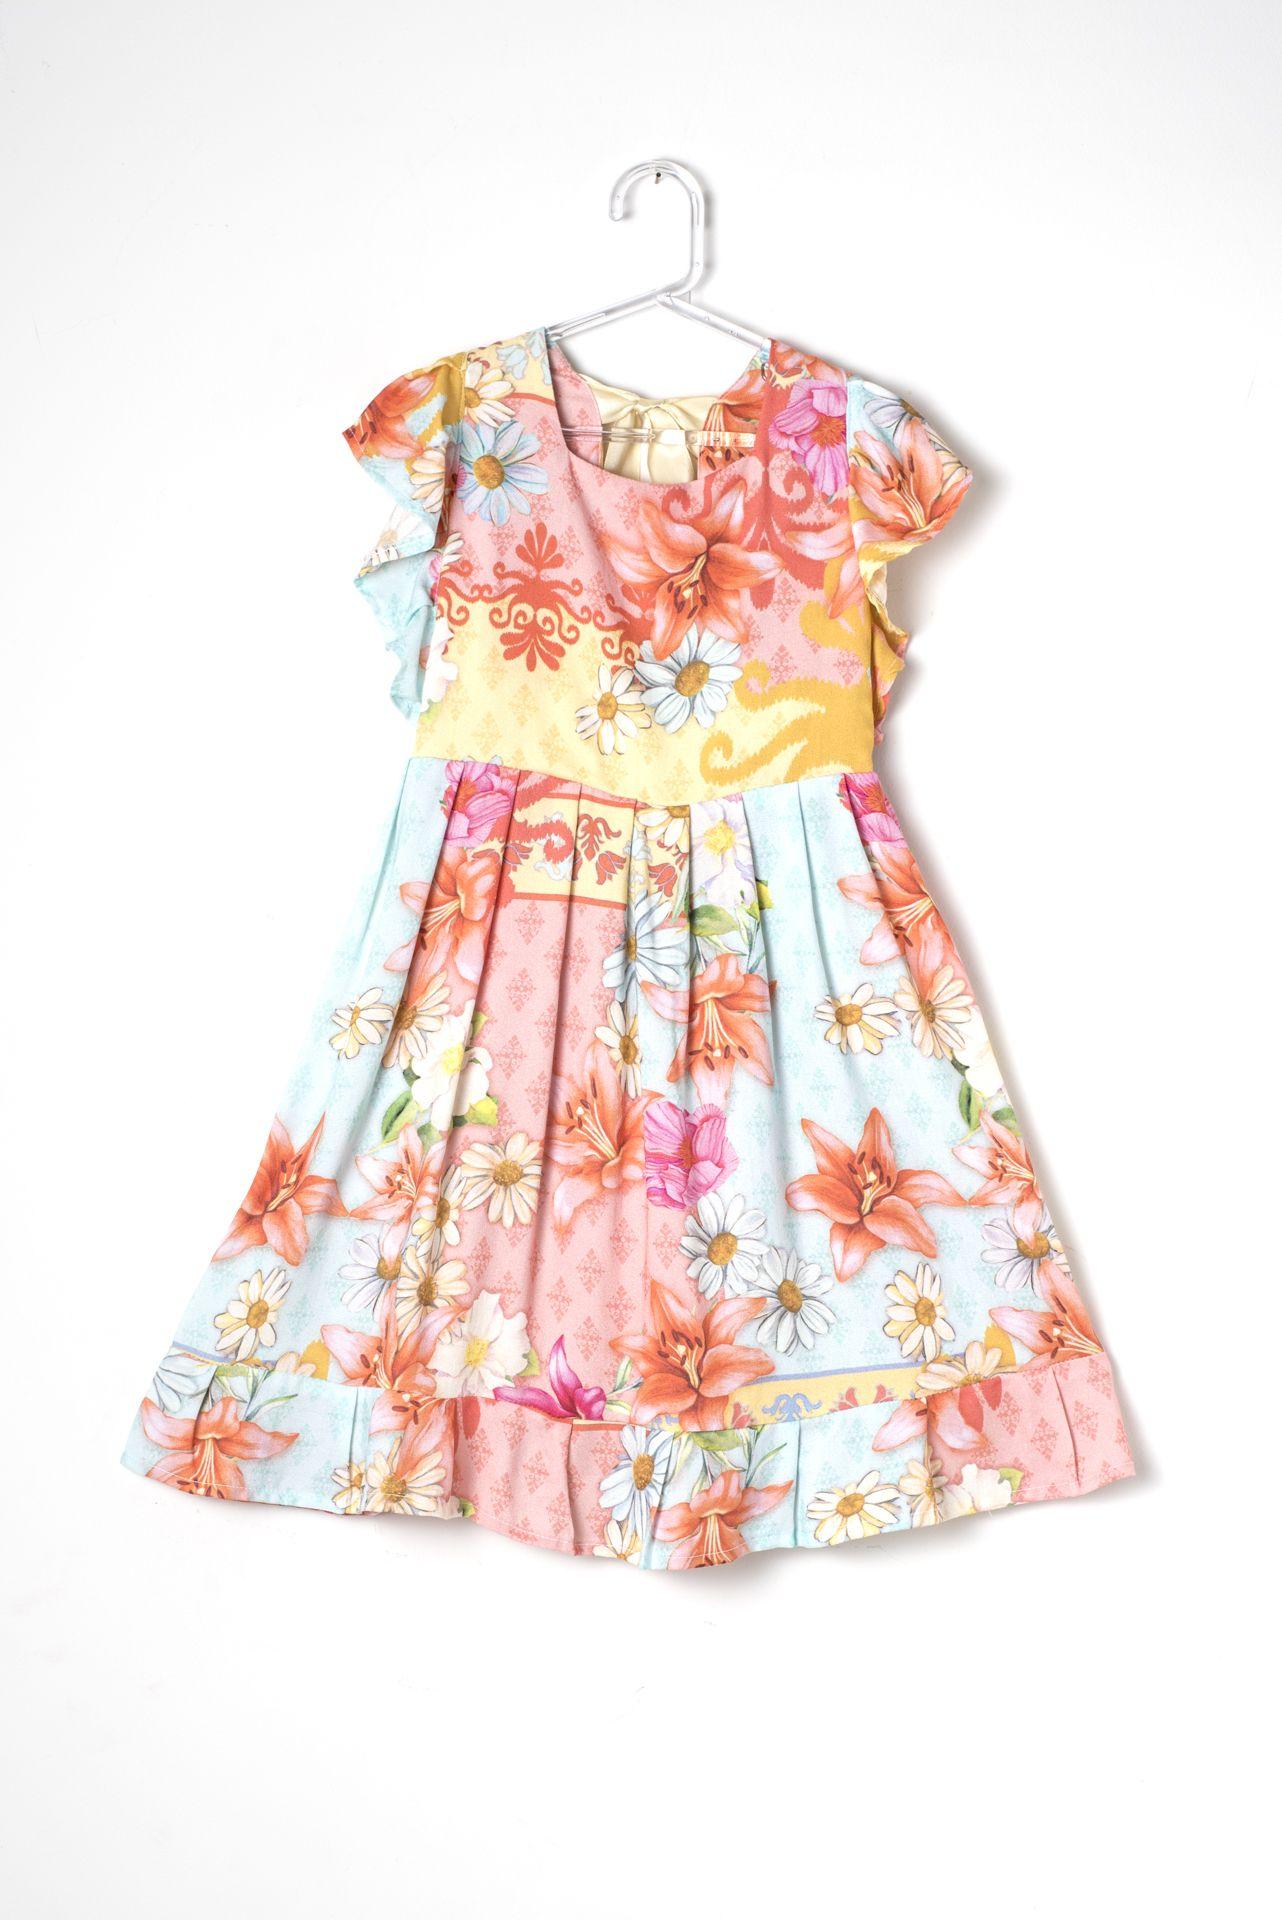 Vestido Infantil Maitê Jardim Suave - Oficinazinha